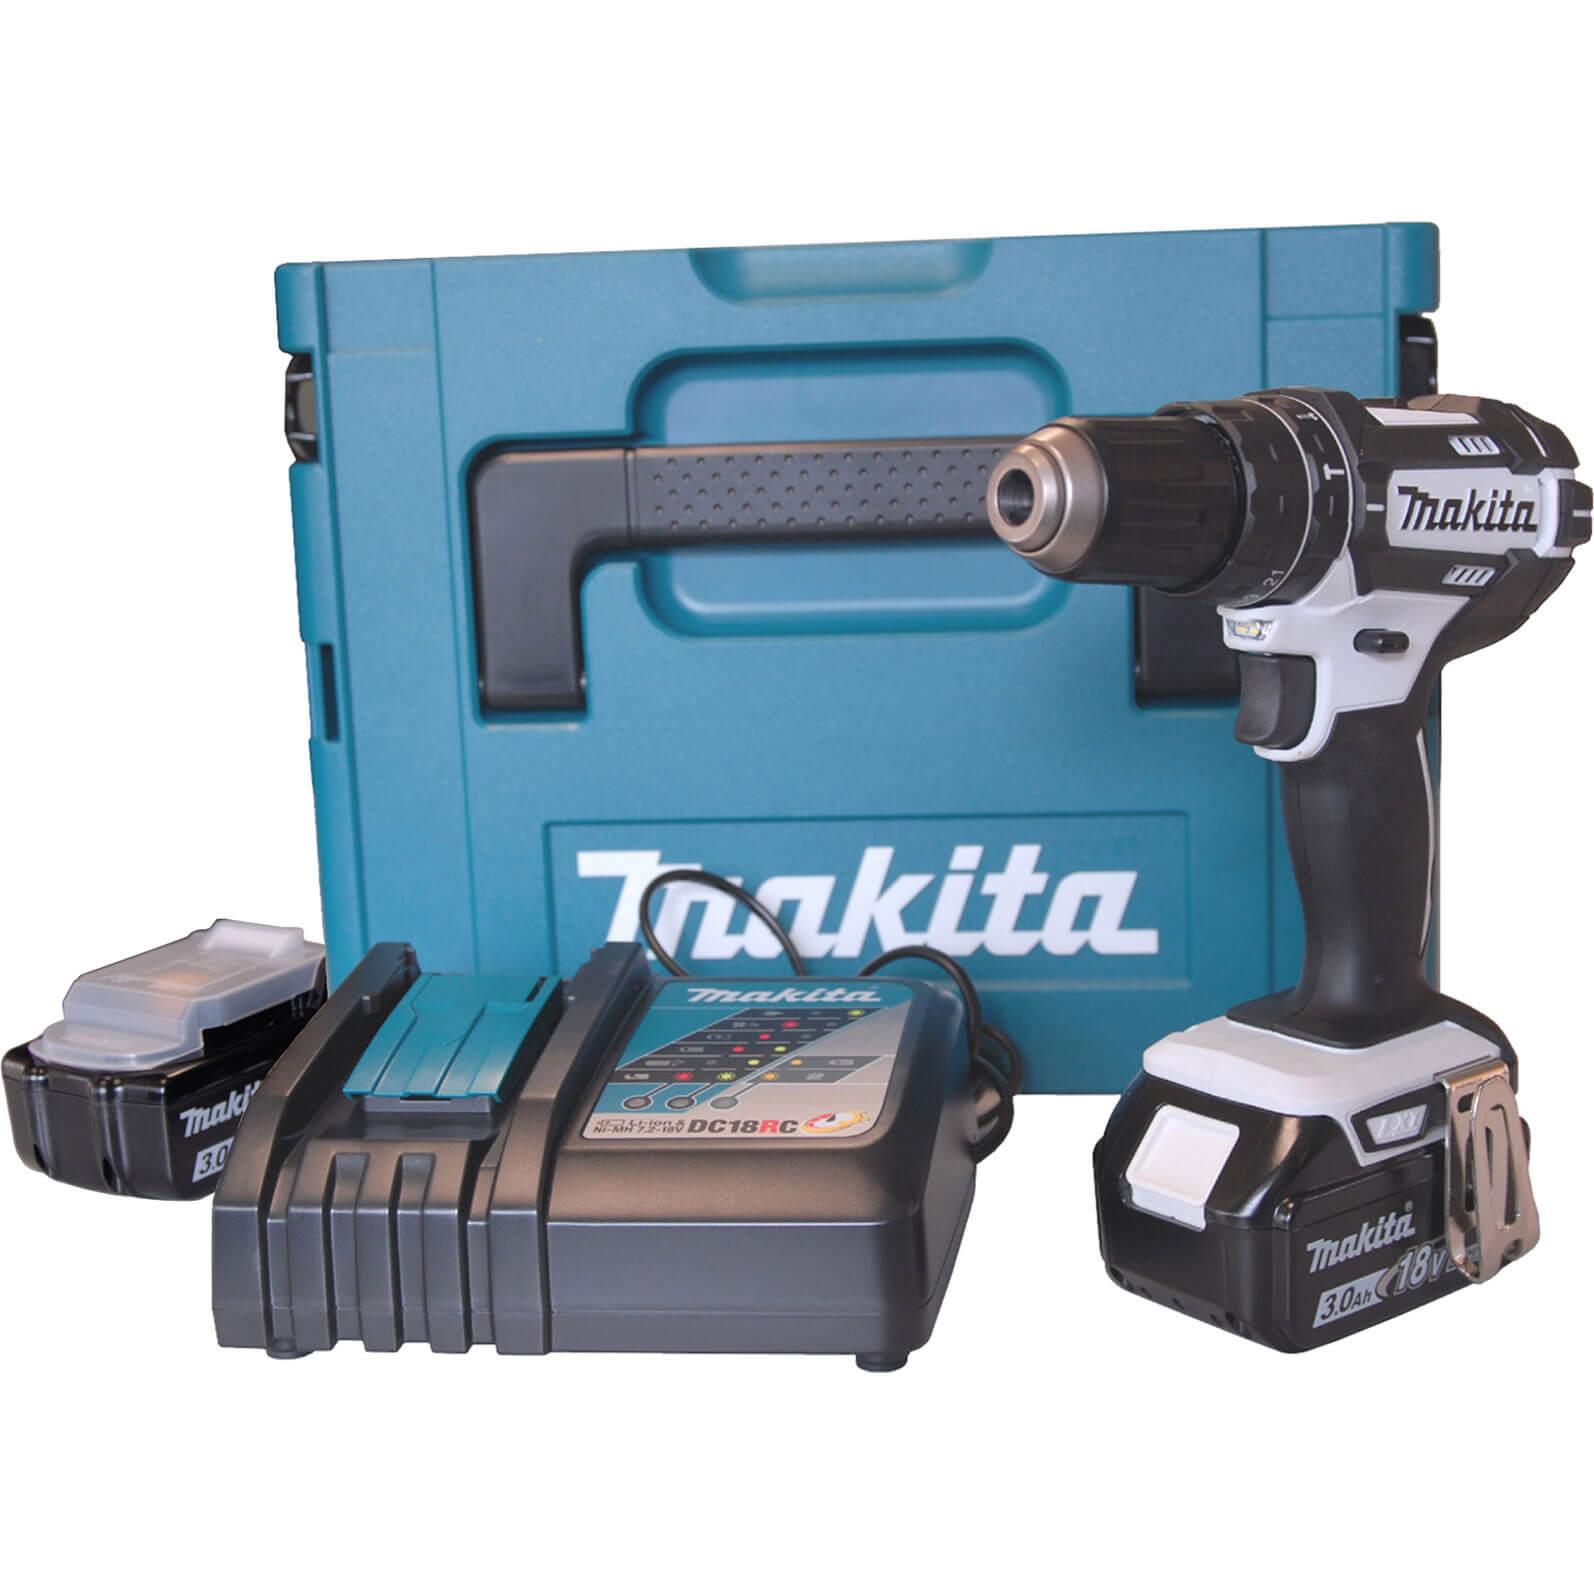 Makita DHP482RFWJ 18v Cordless LXT Combi Drill with 2 Liion Batteries 3ah